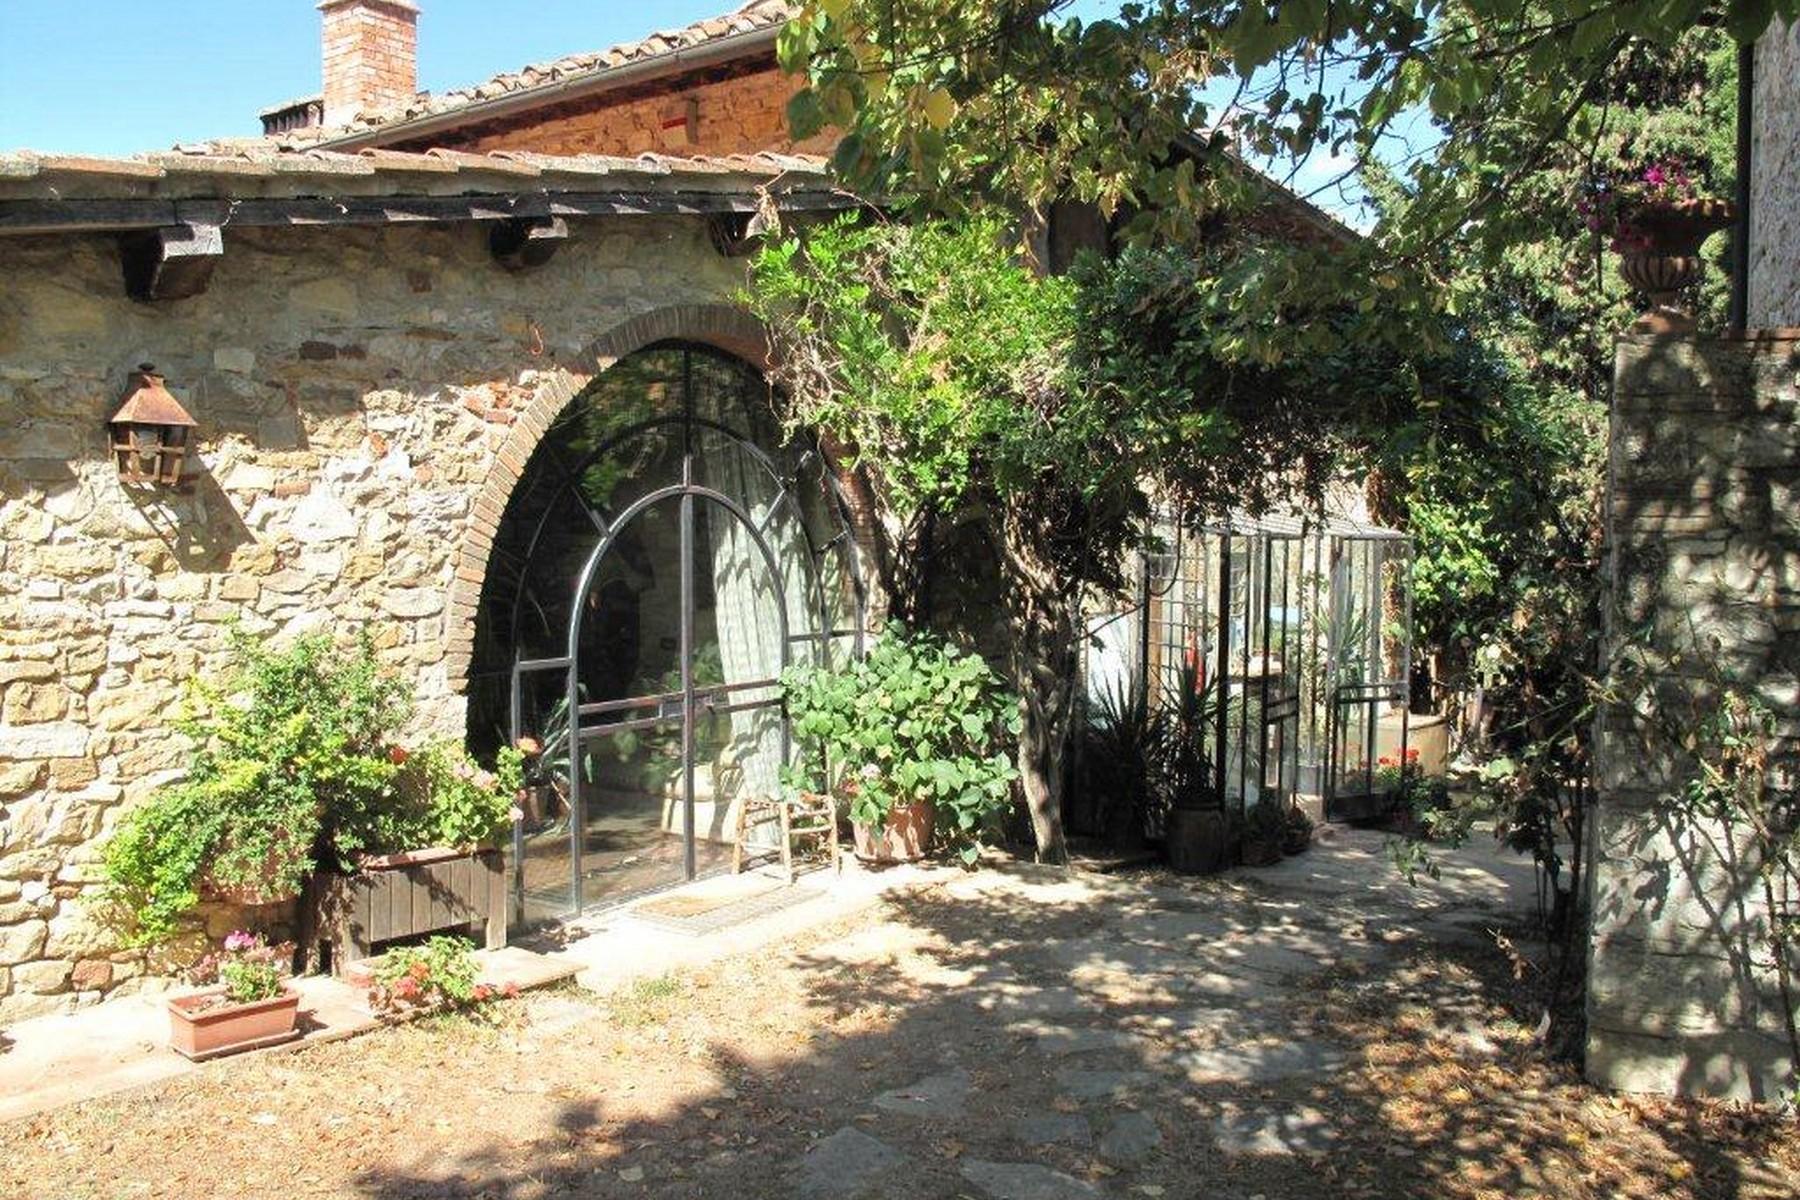 Villa in Vendita a Greve In Chianti: 5 locali, 400 mq - Foto 10